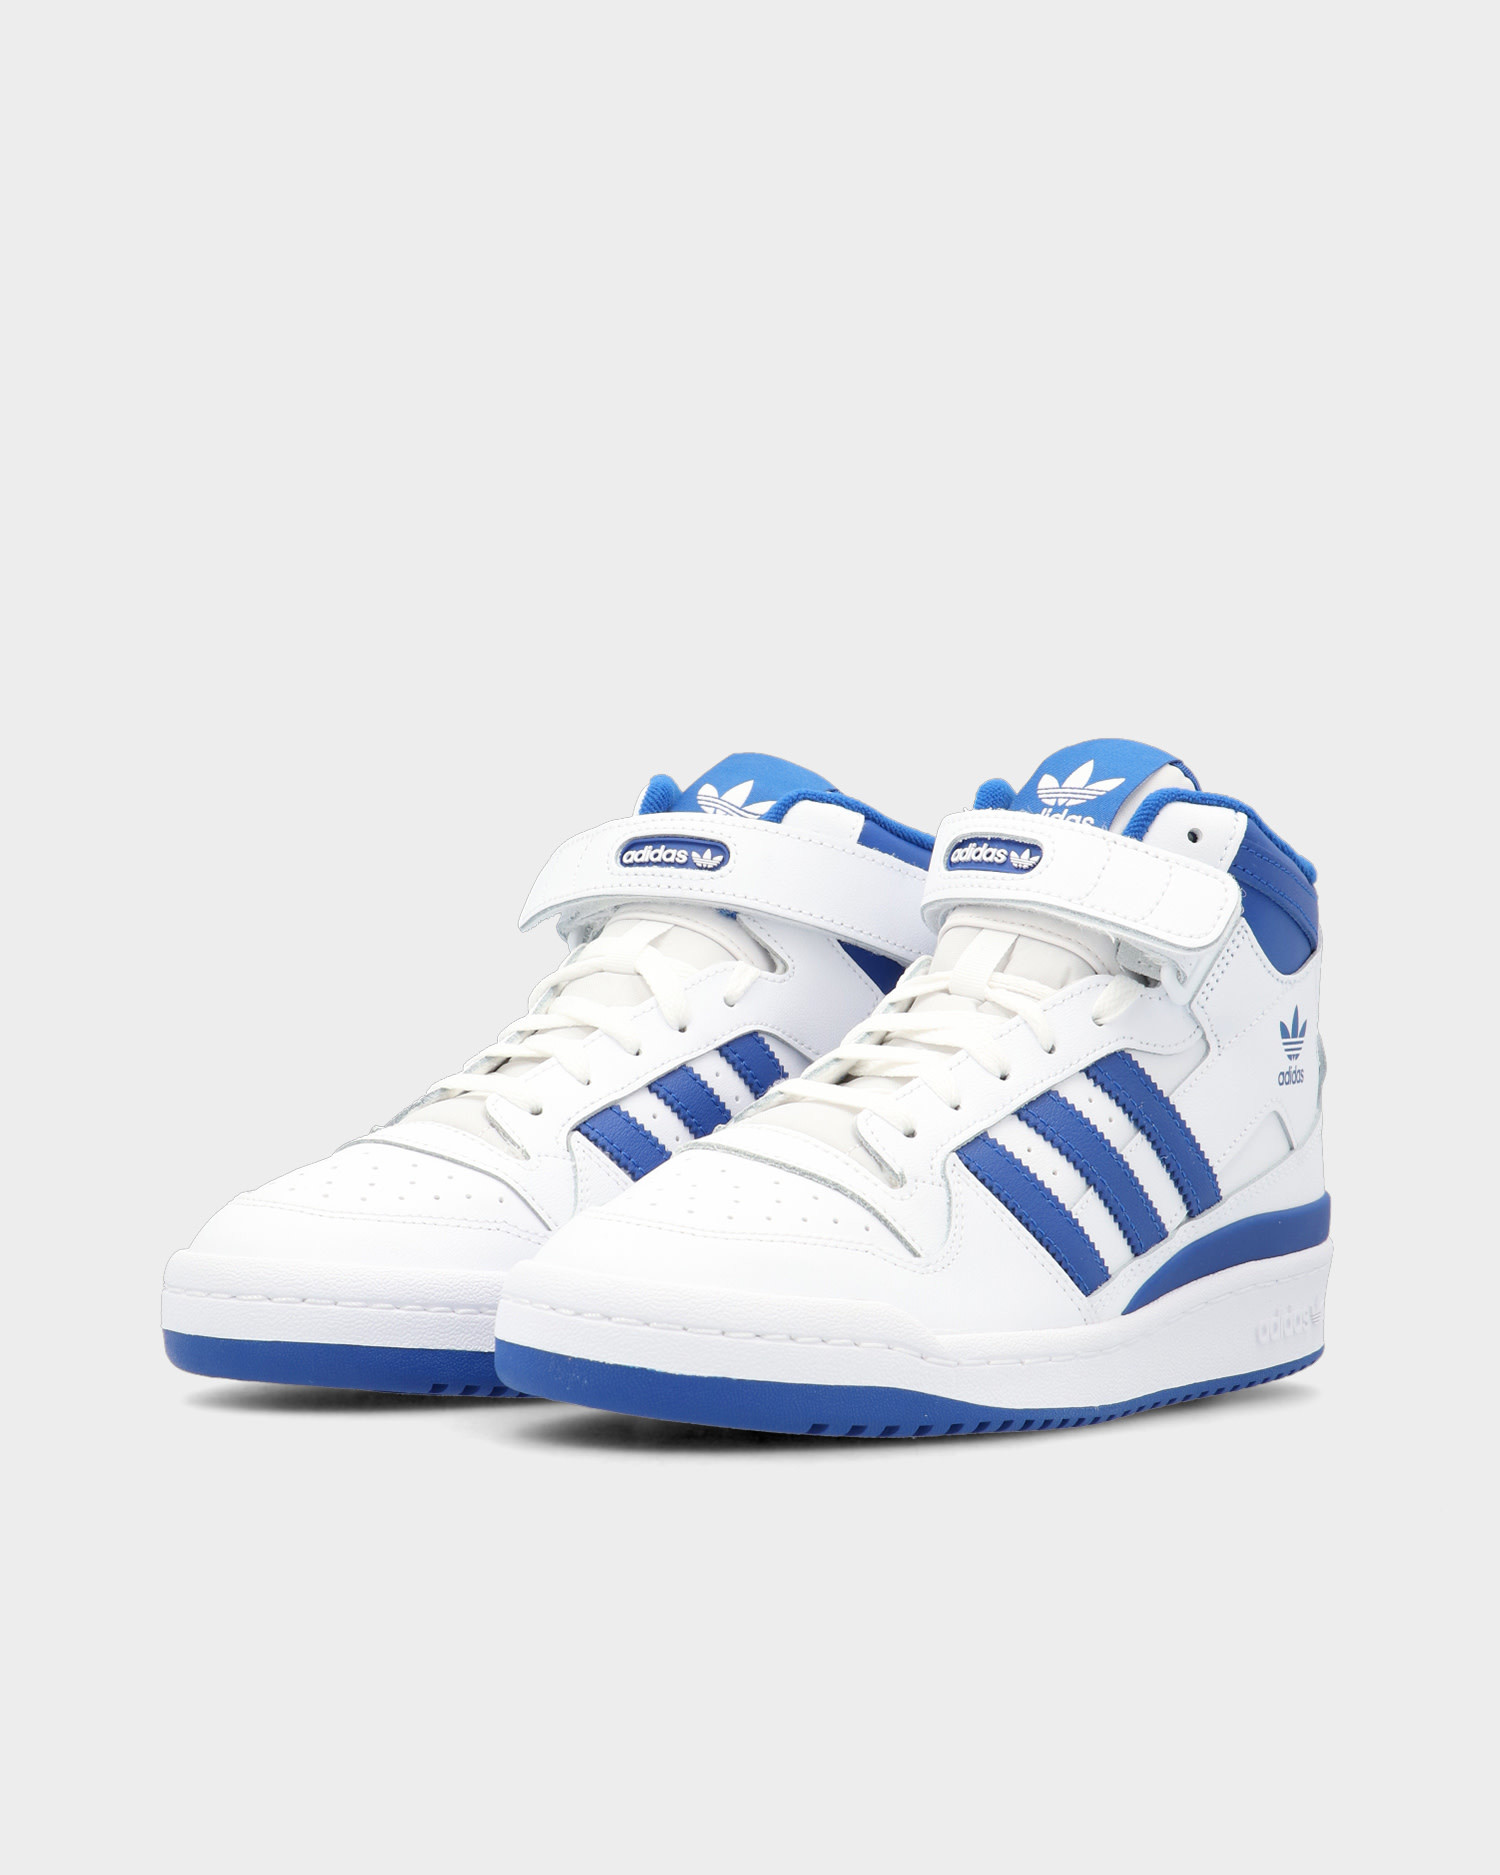 Adidas Forum Mid Cloud White / Royal Blue / Cloud White